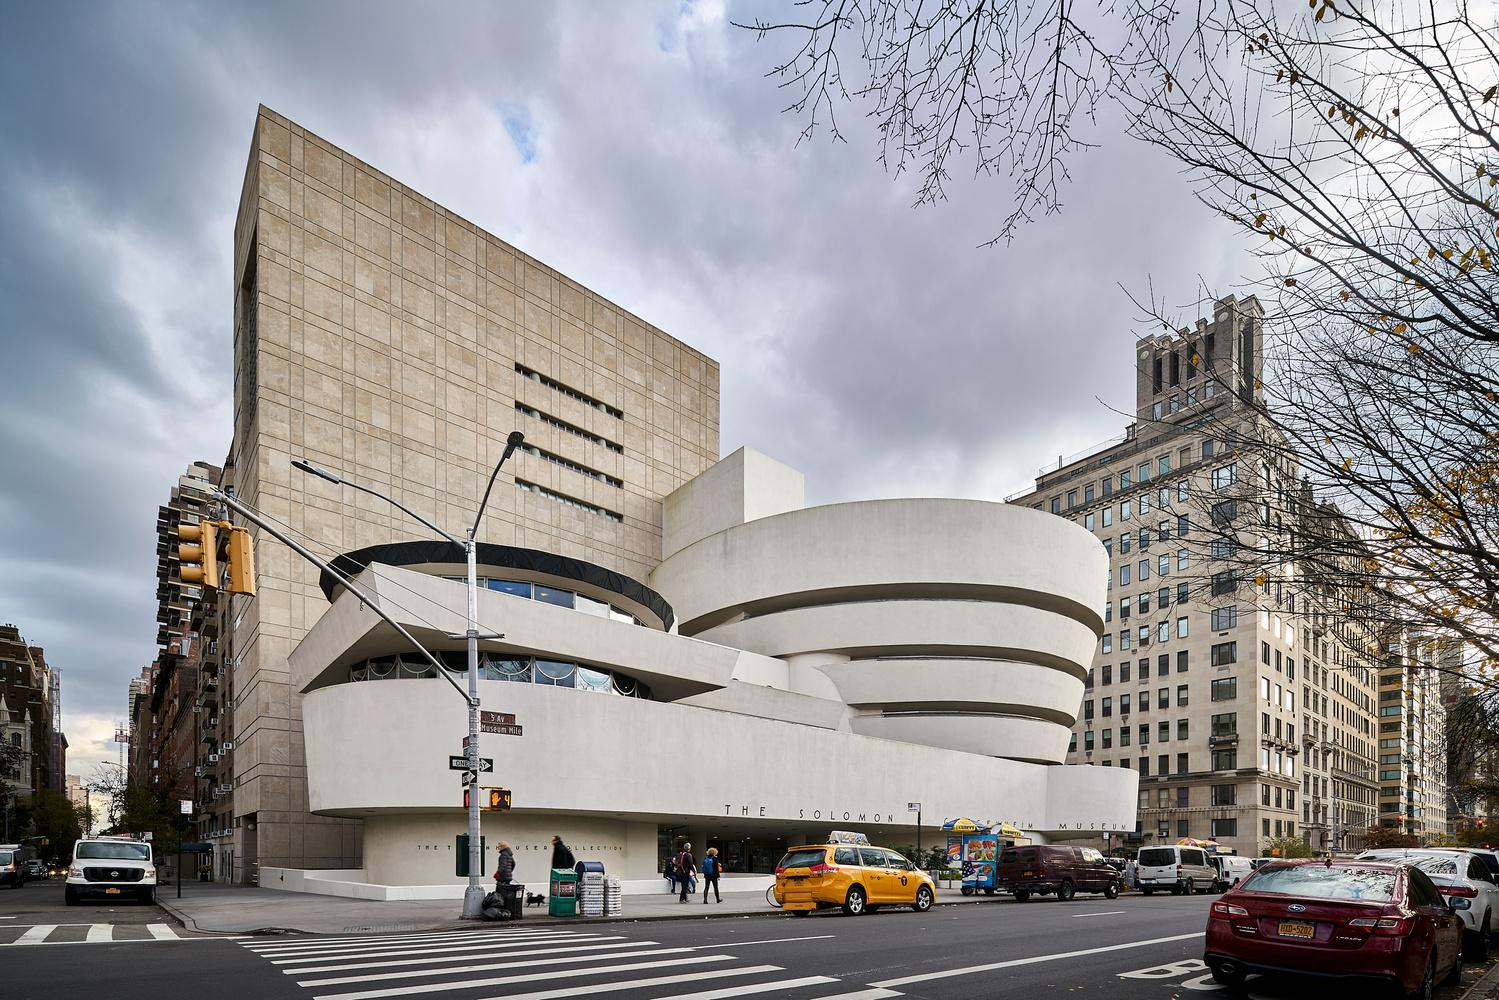 NYC Guggenheim by Sebastian Grundgeir